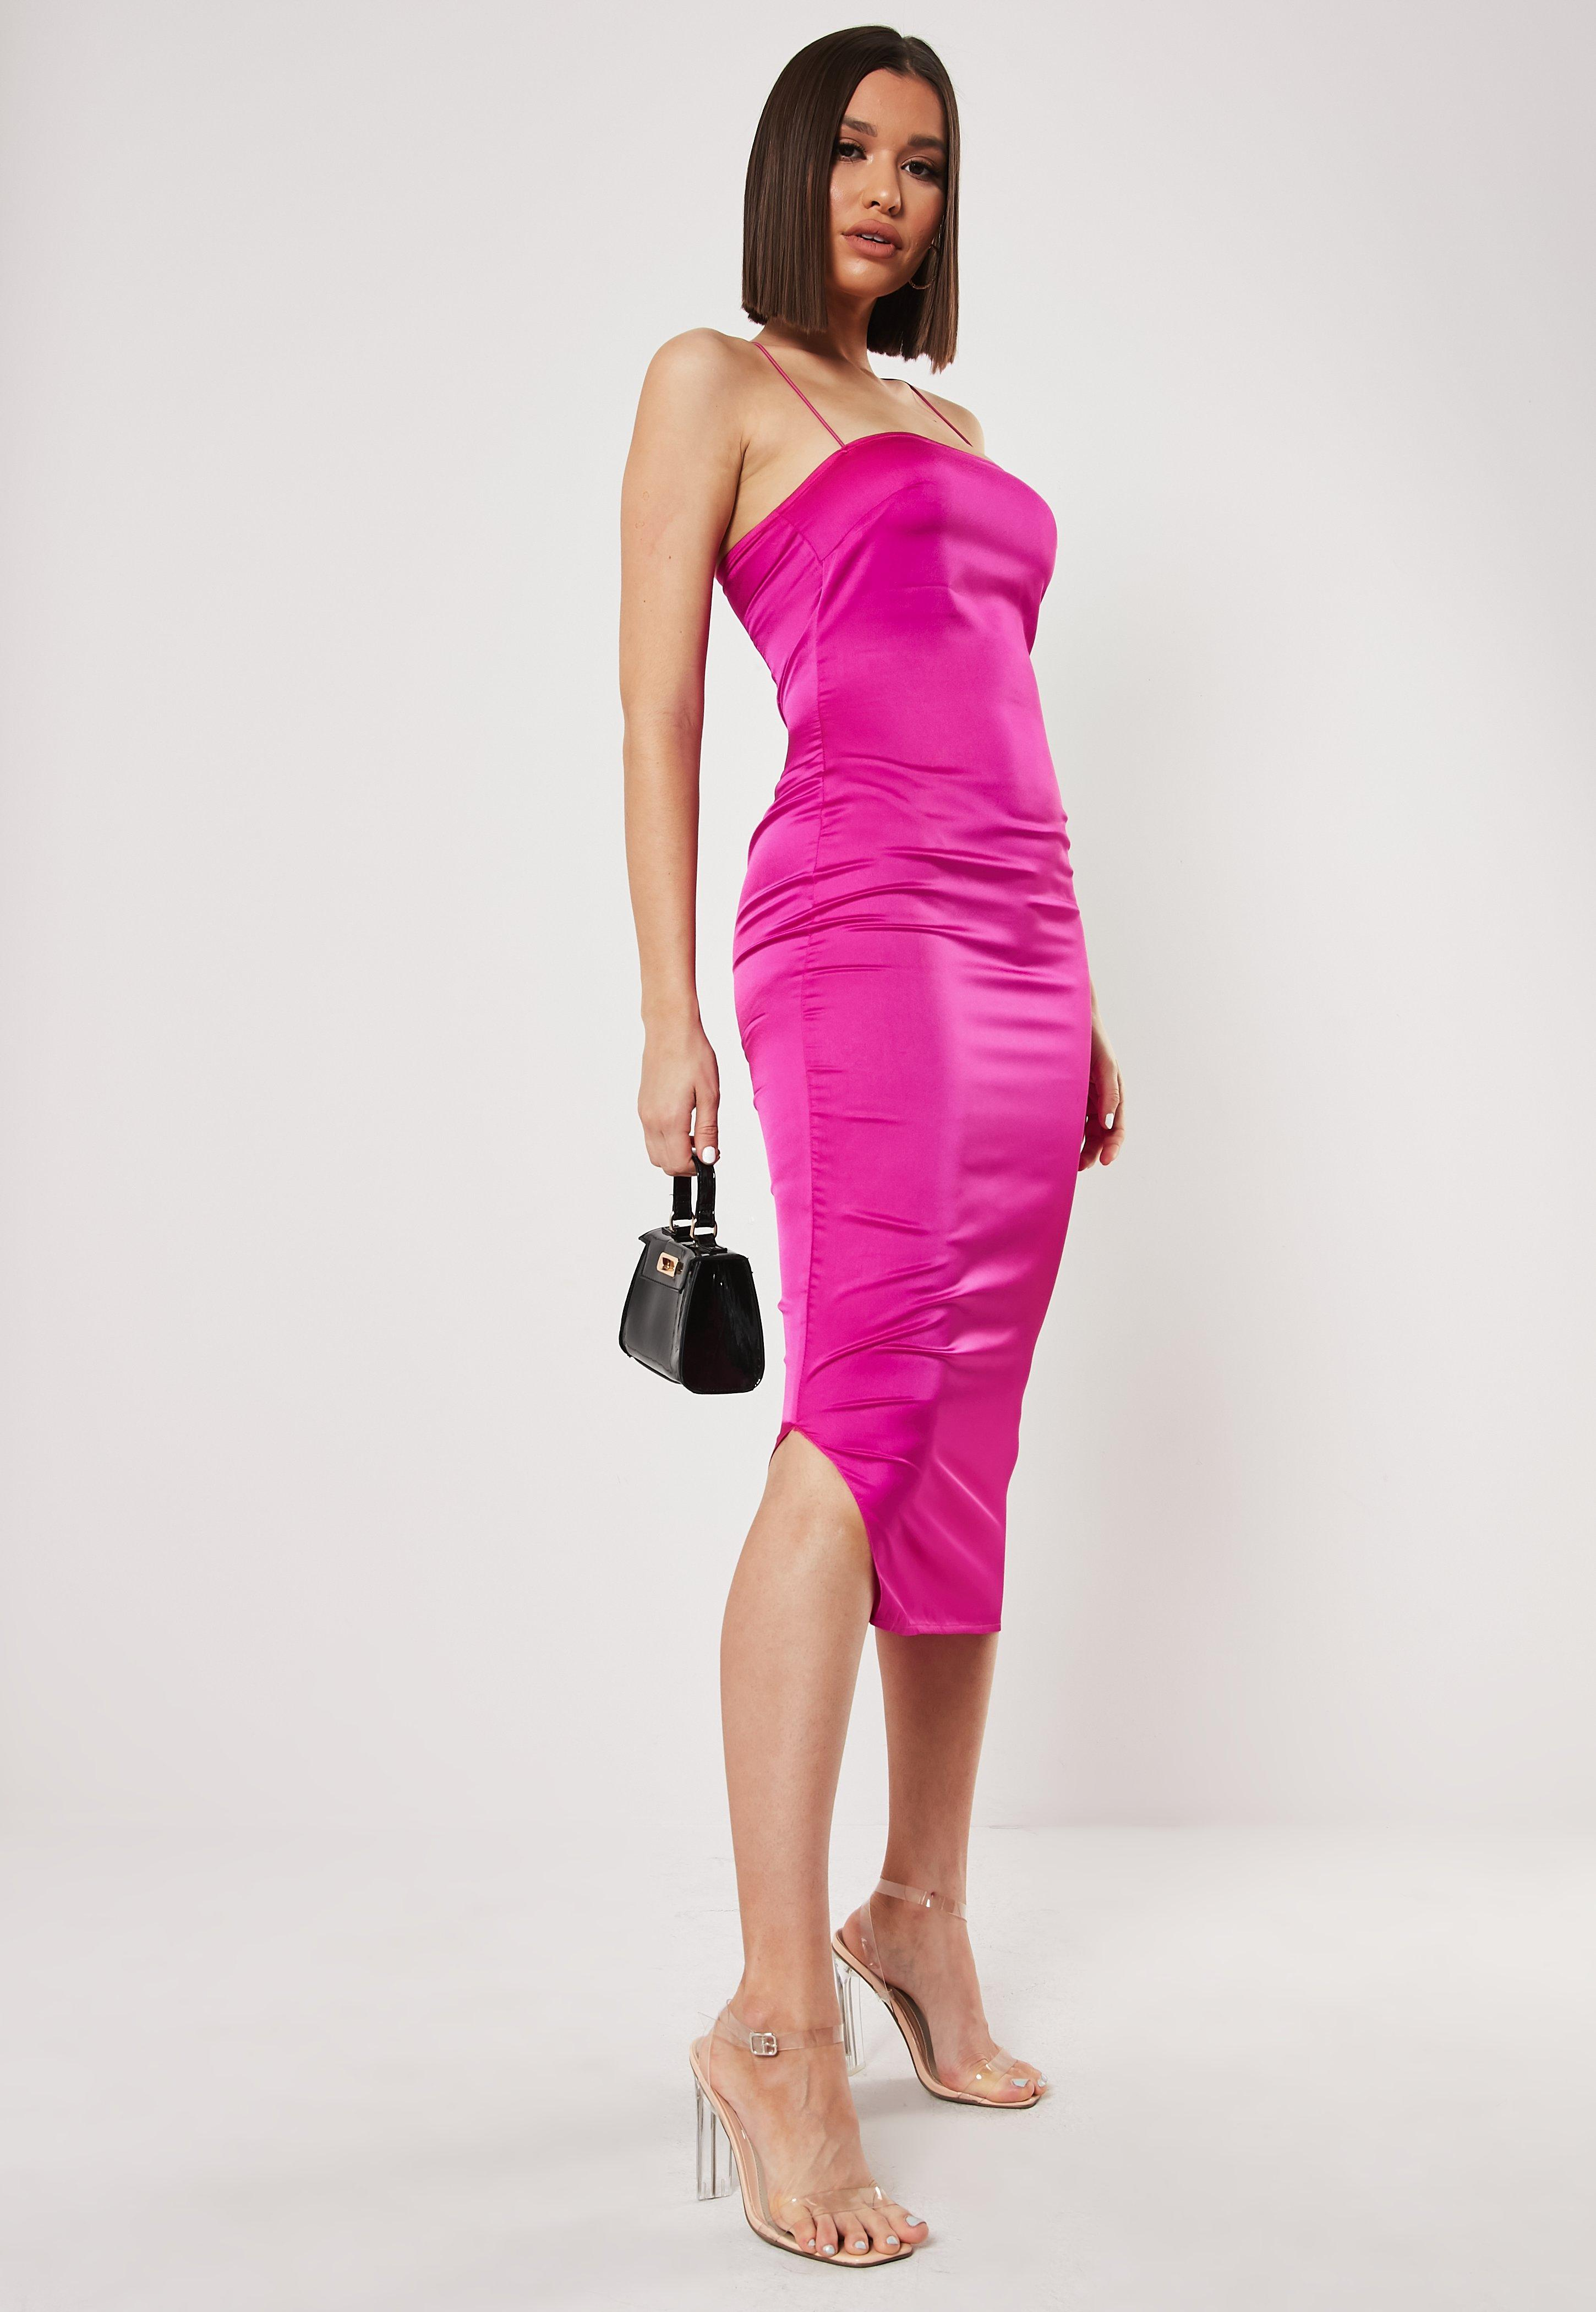 fab8c918b01d Satin Dress - Silky Dresses Online | Missguided